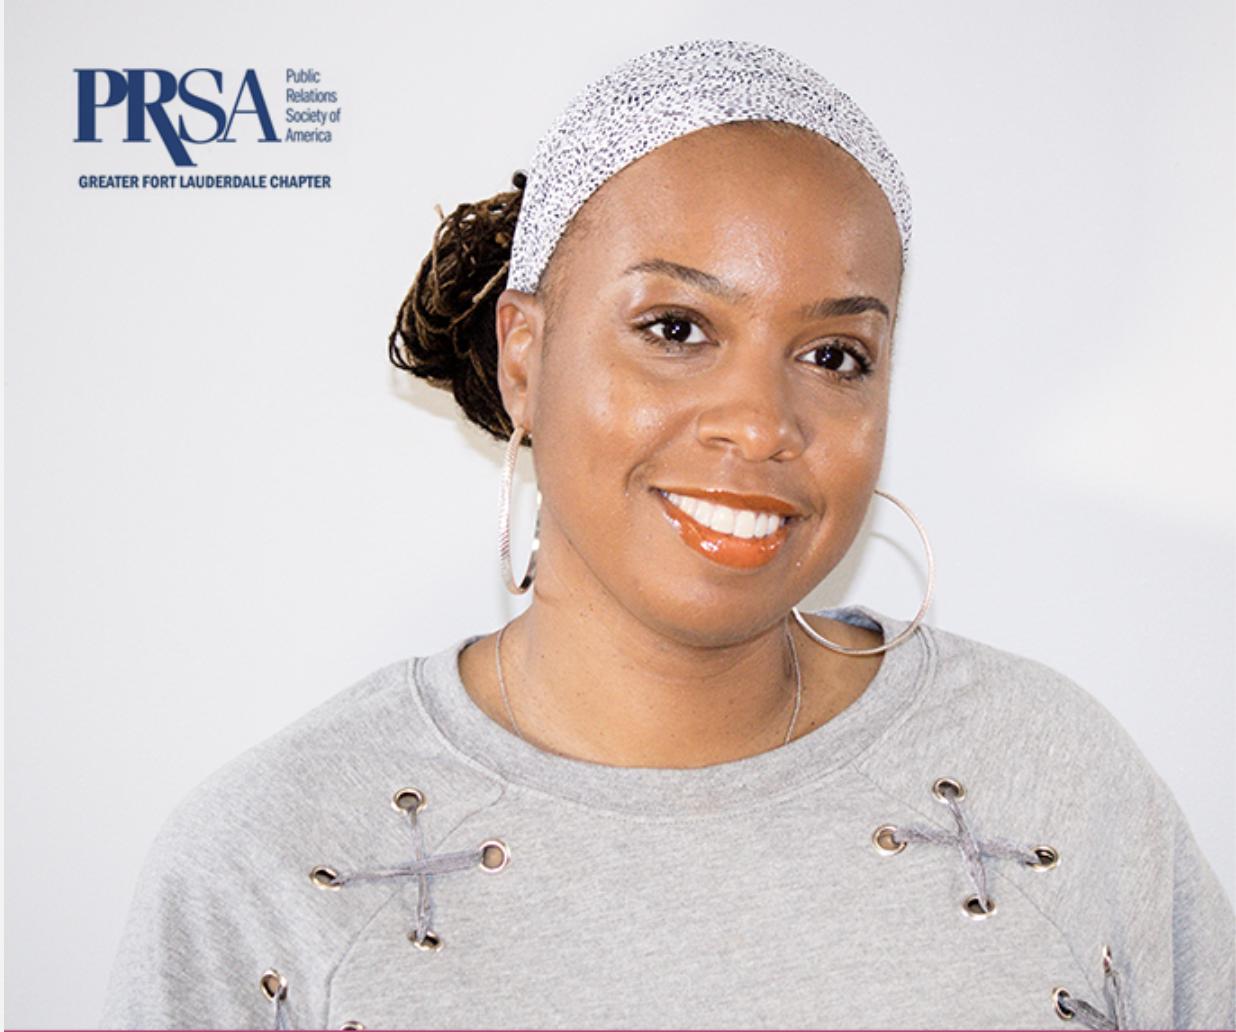 Teana McDonald 2018/2019 Secretary for PRSA Greater Fort Lauderdale